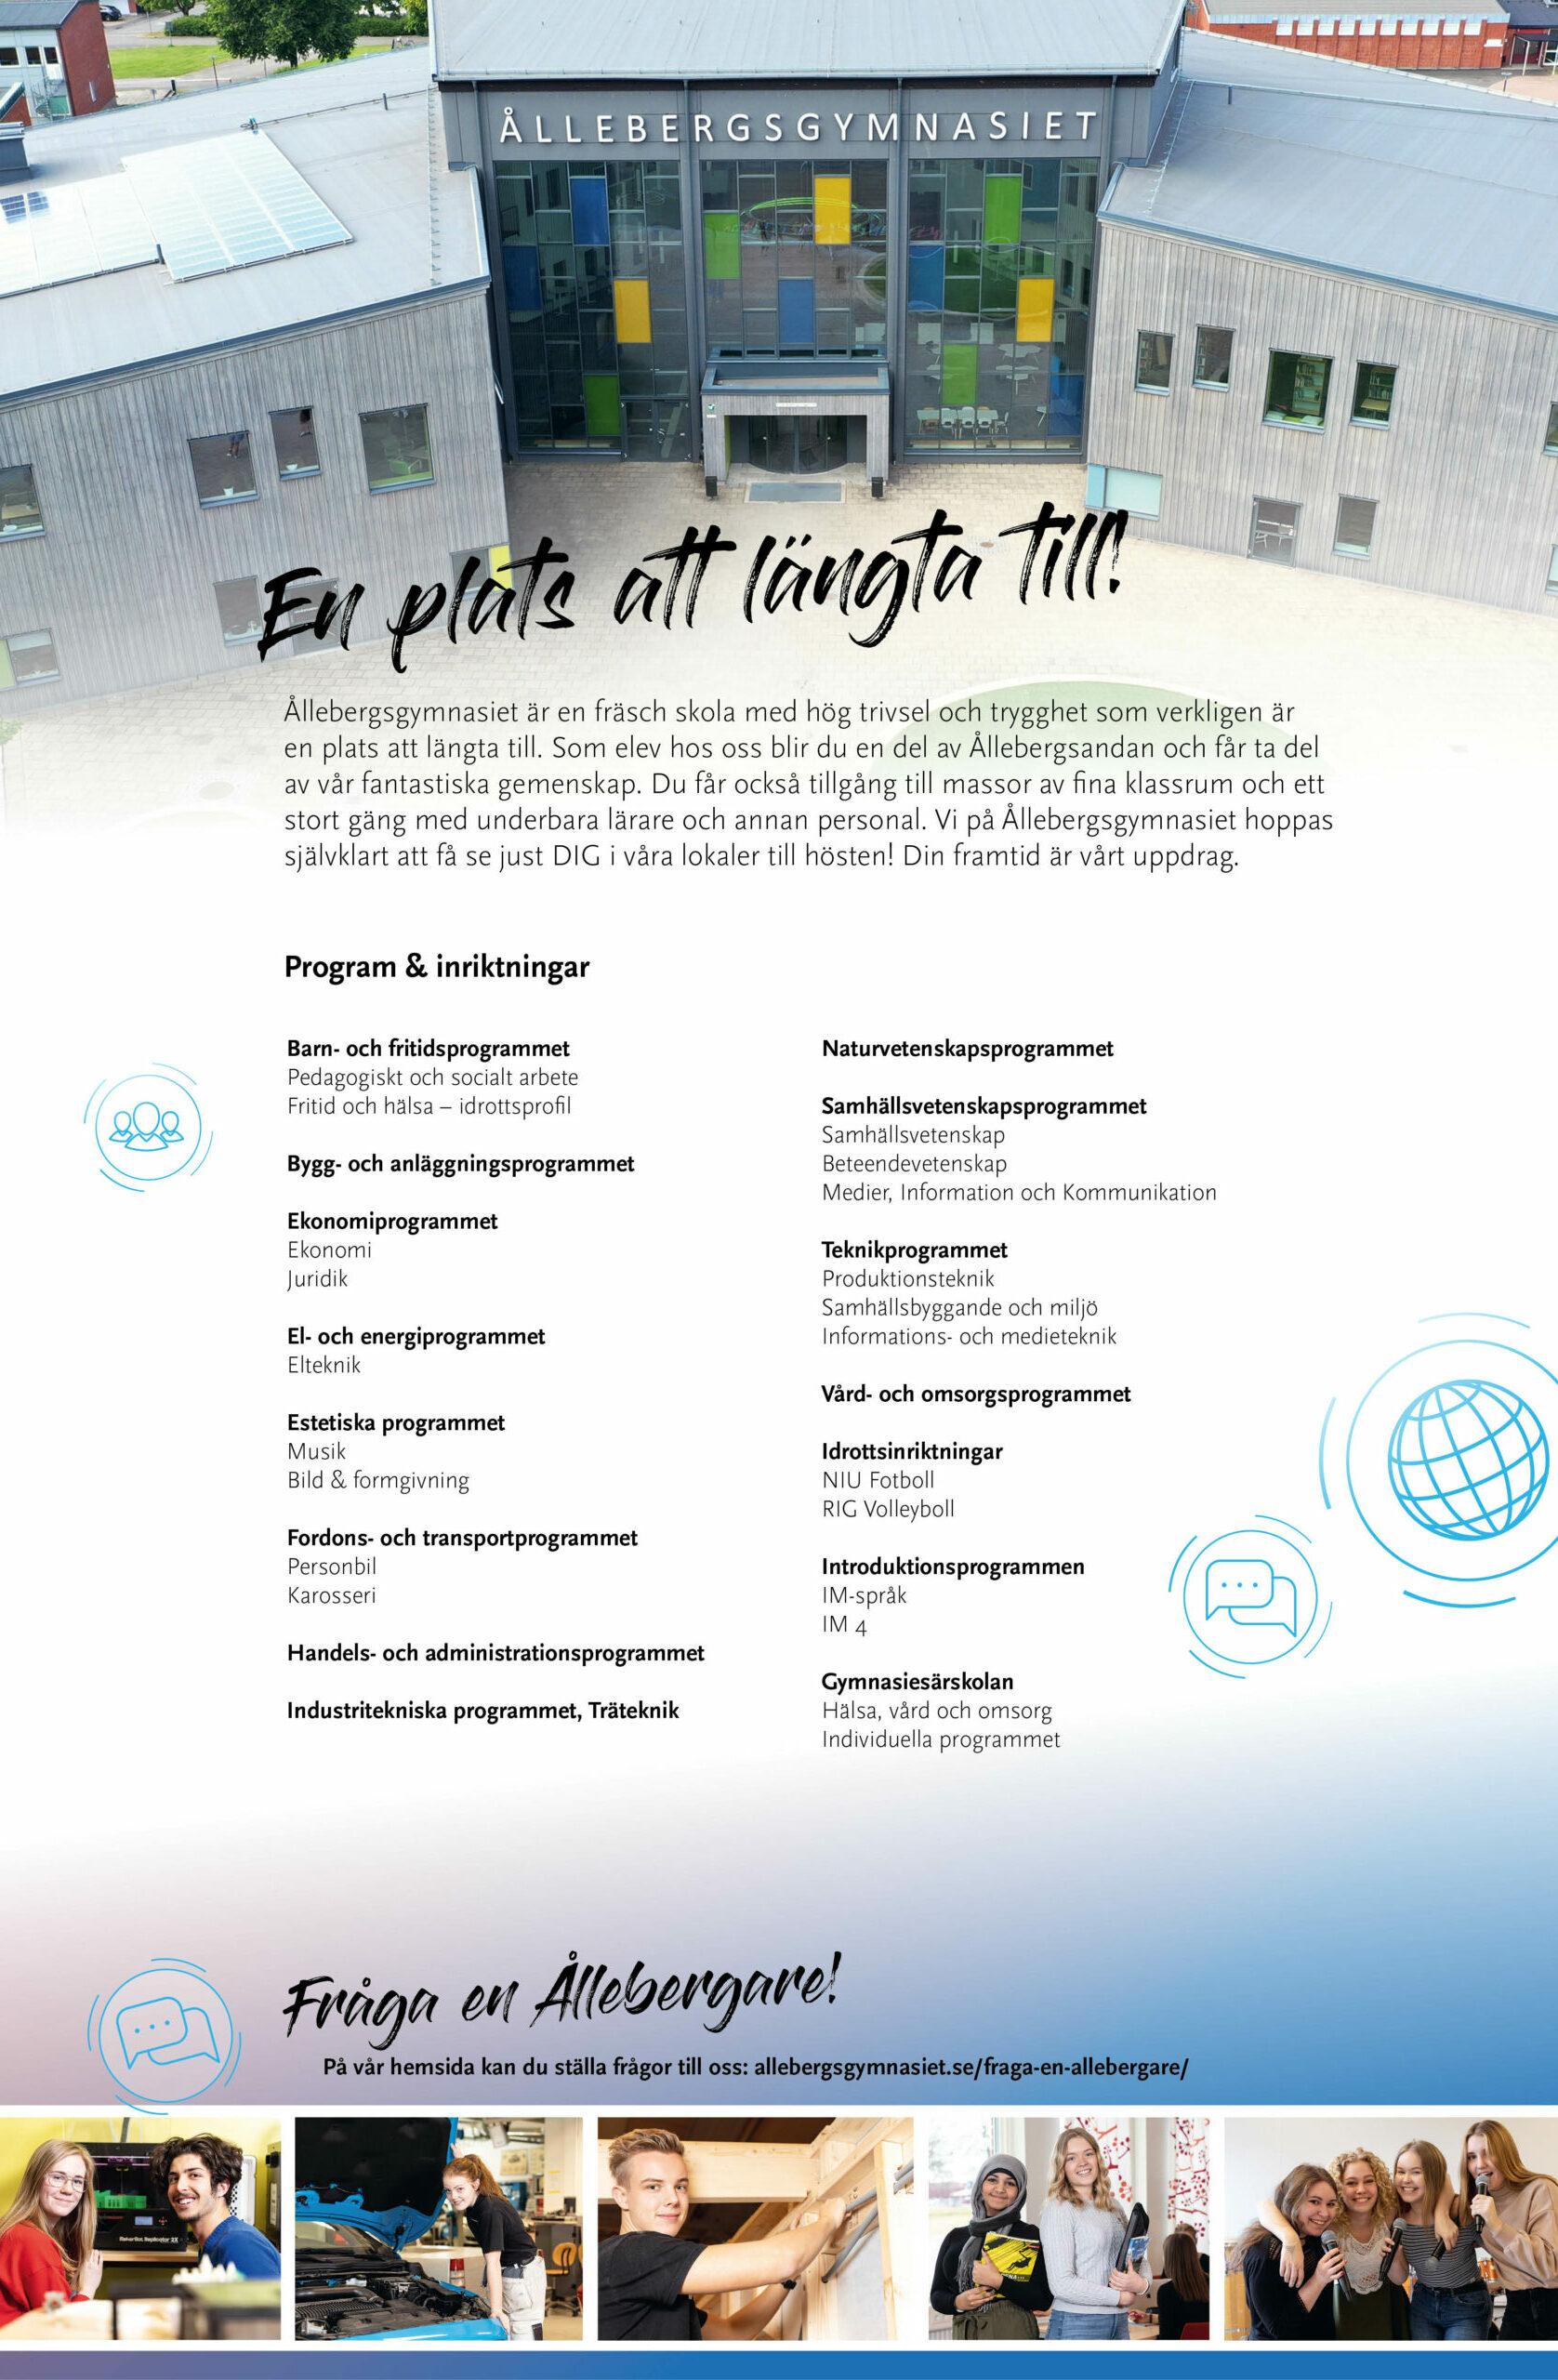 folder, trycksak, informationsmaterial, Ållebergsgymnasiet, grafisk design, Falköping